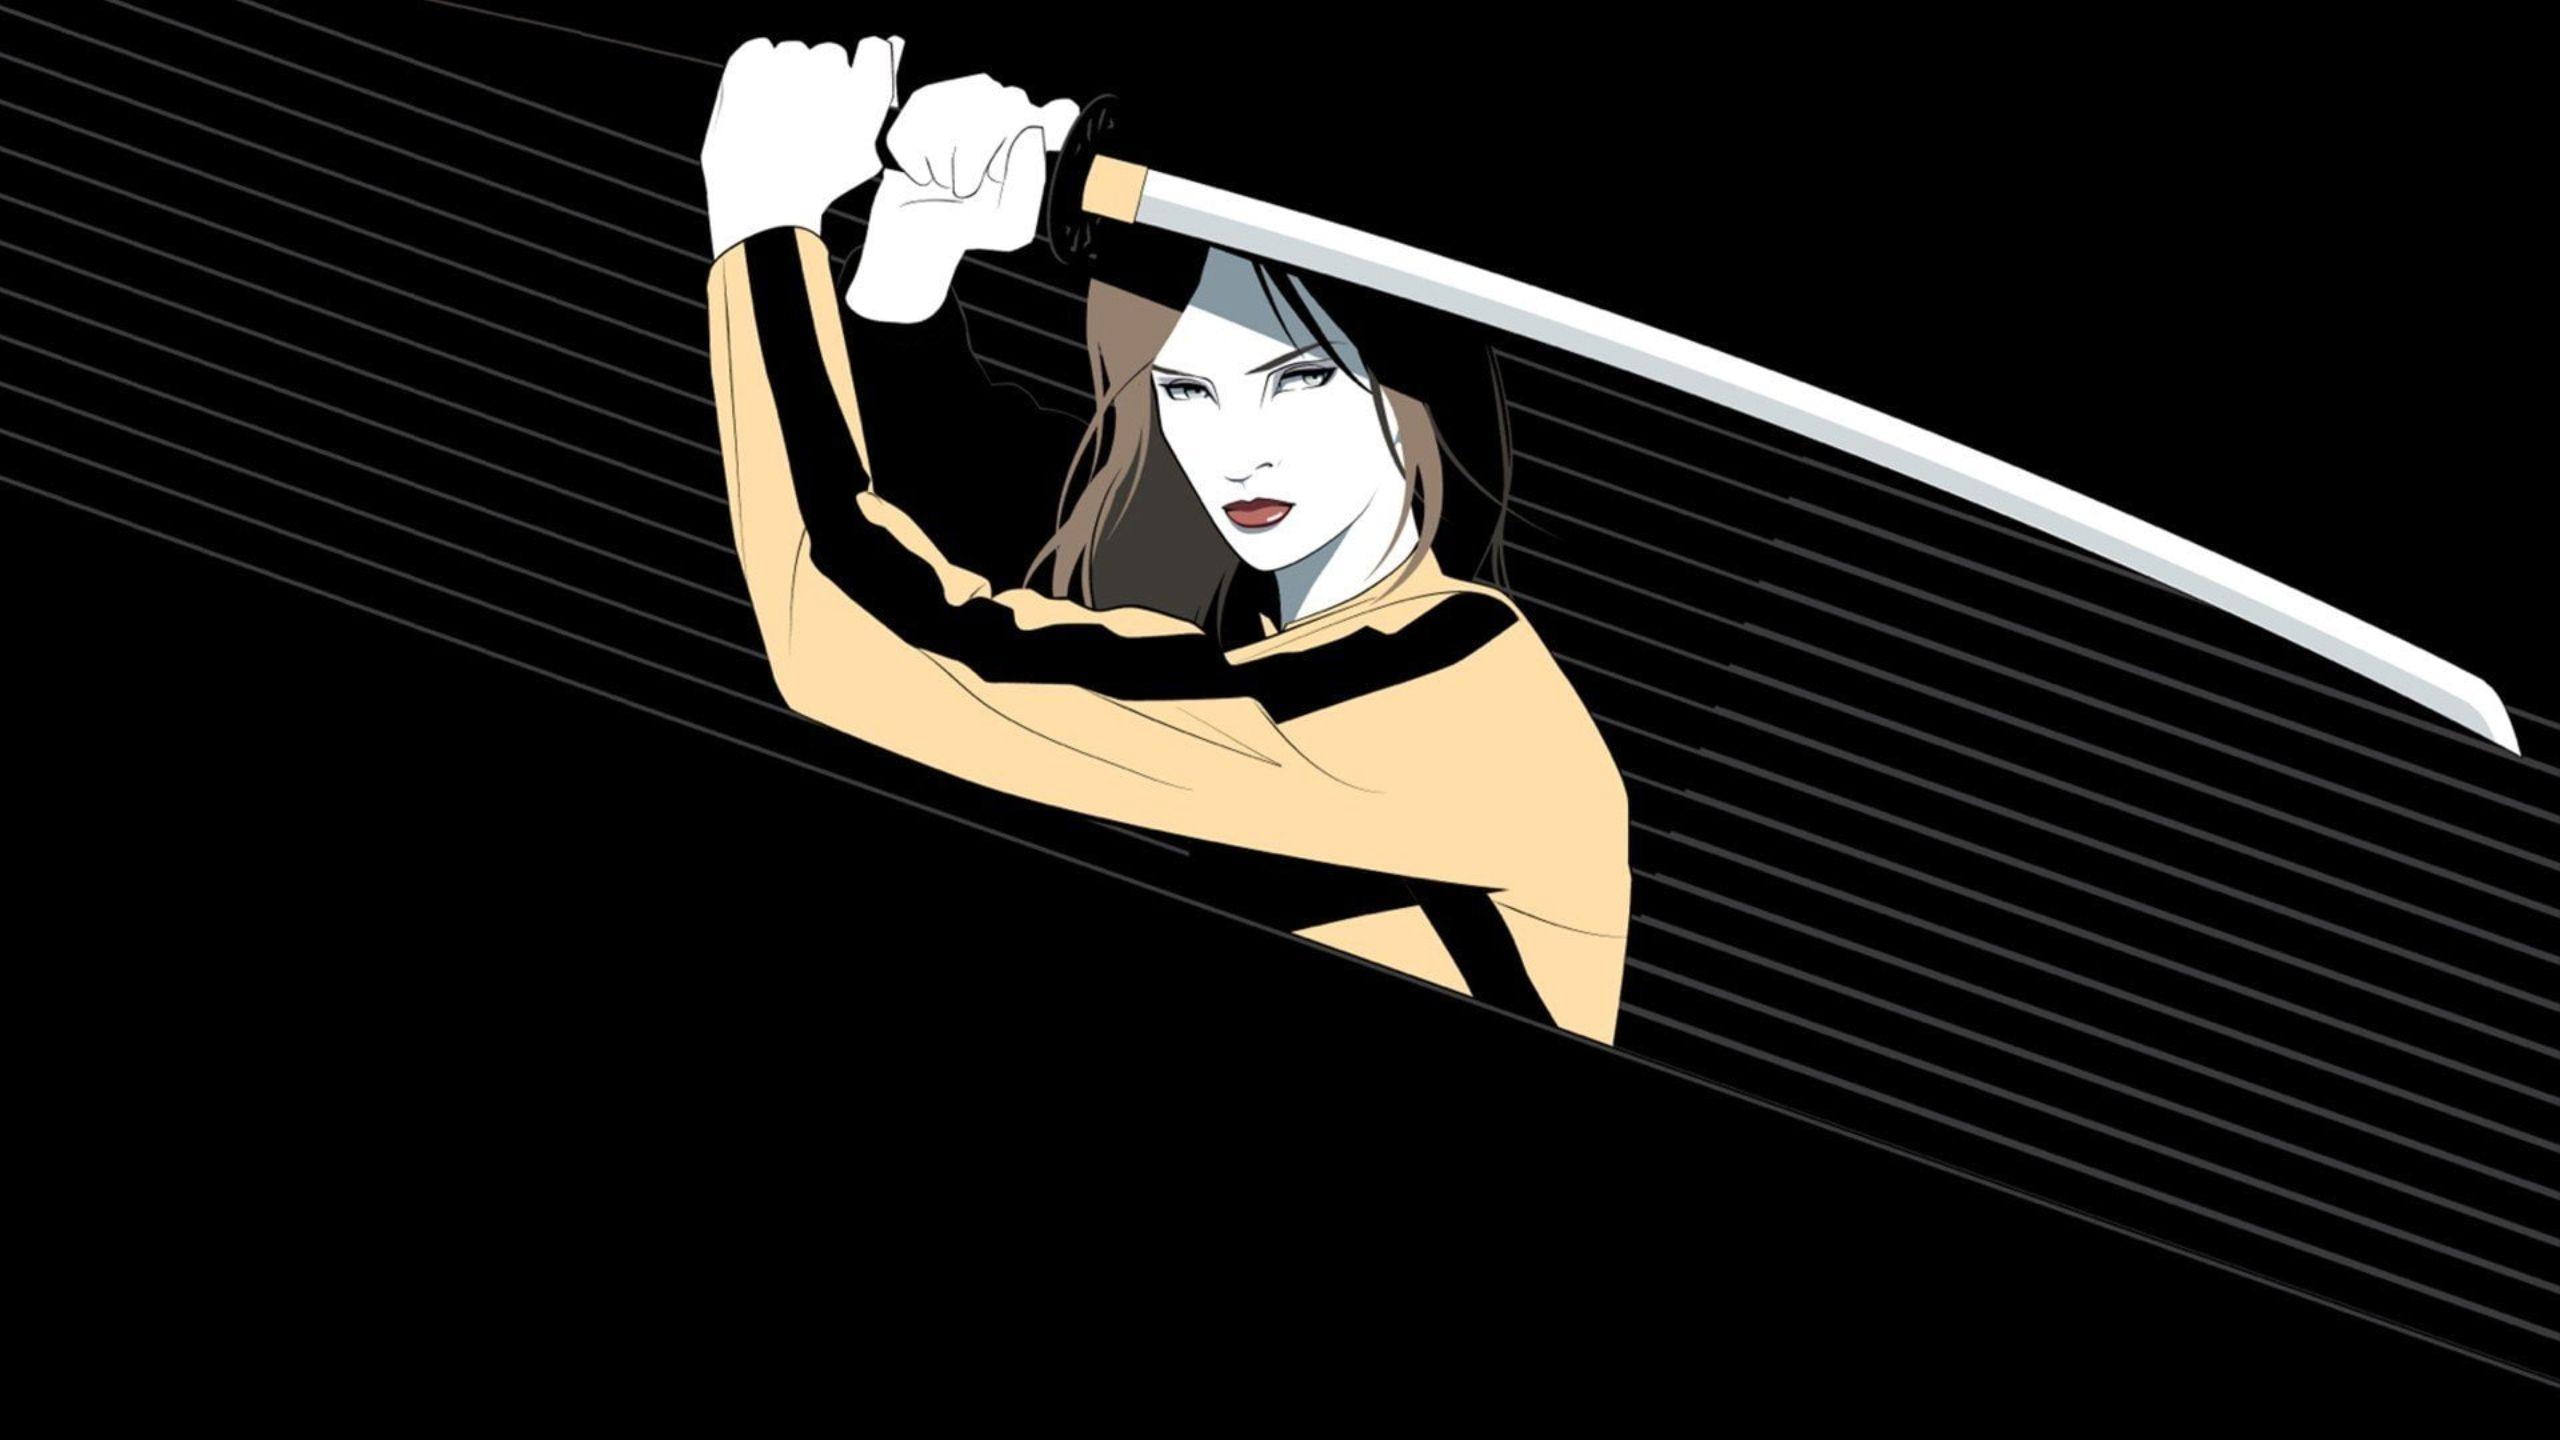 Pin by Javier Baca Vásquez on Kill Bill in 2020 Kill